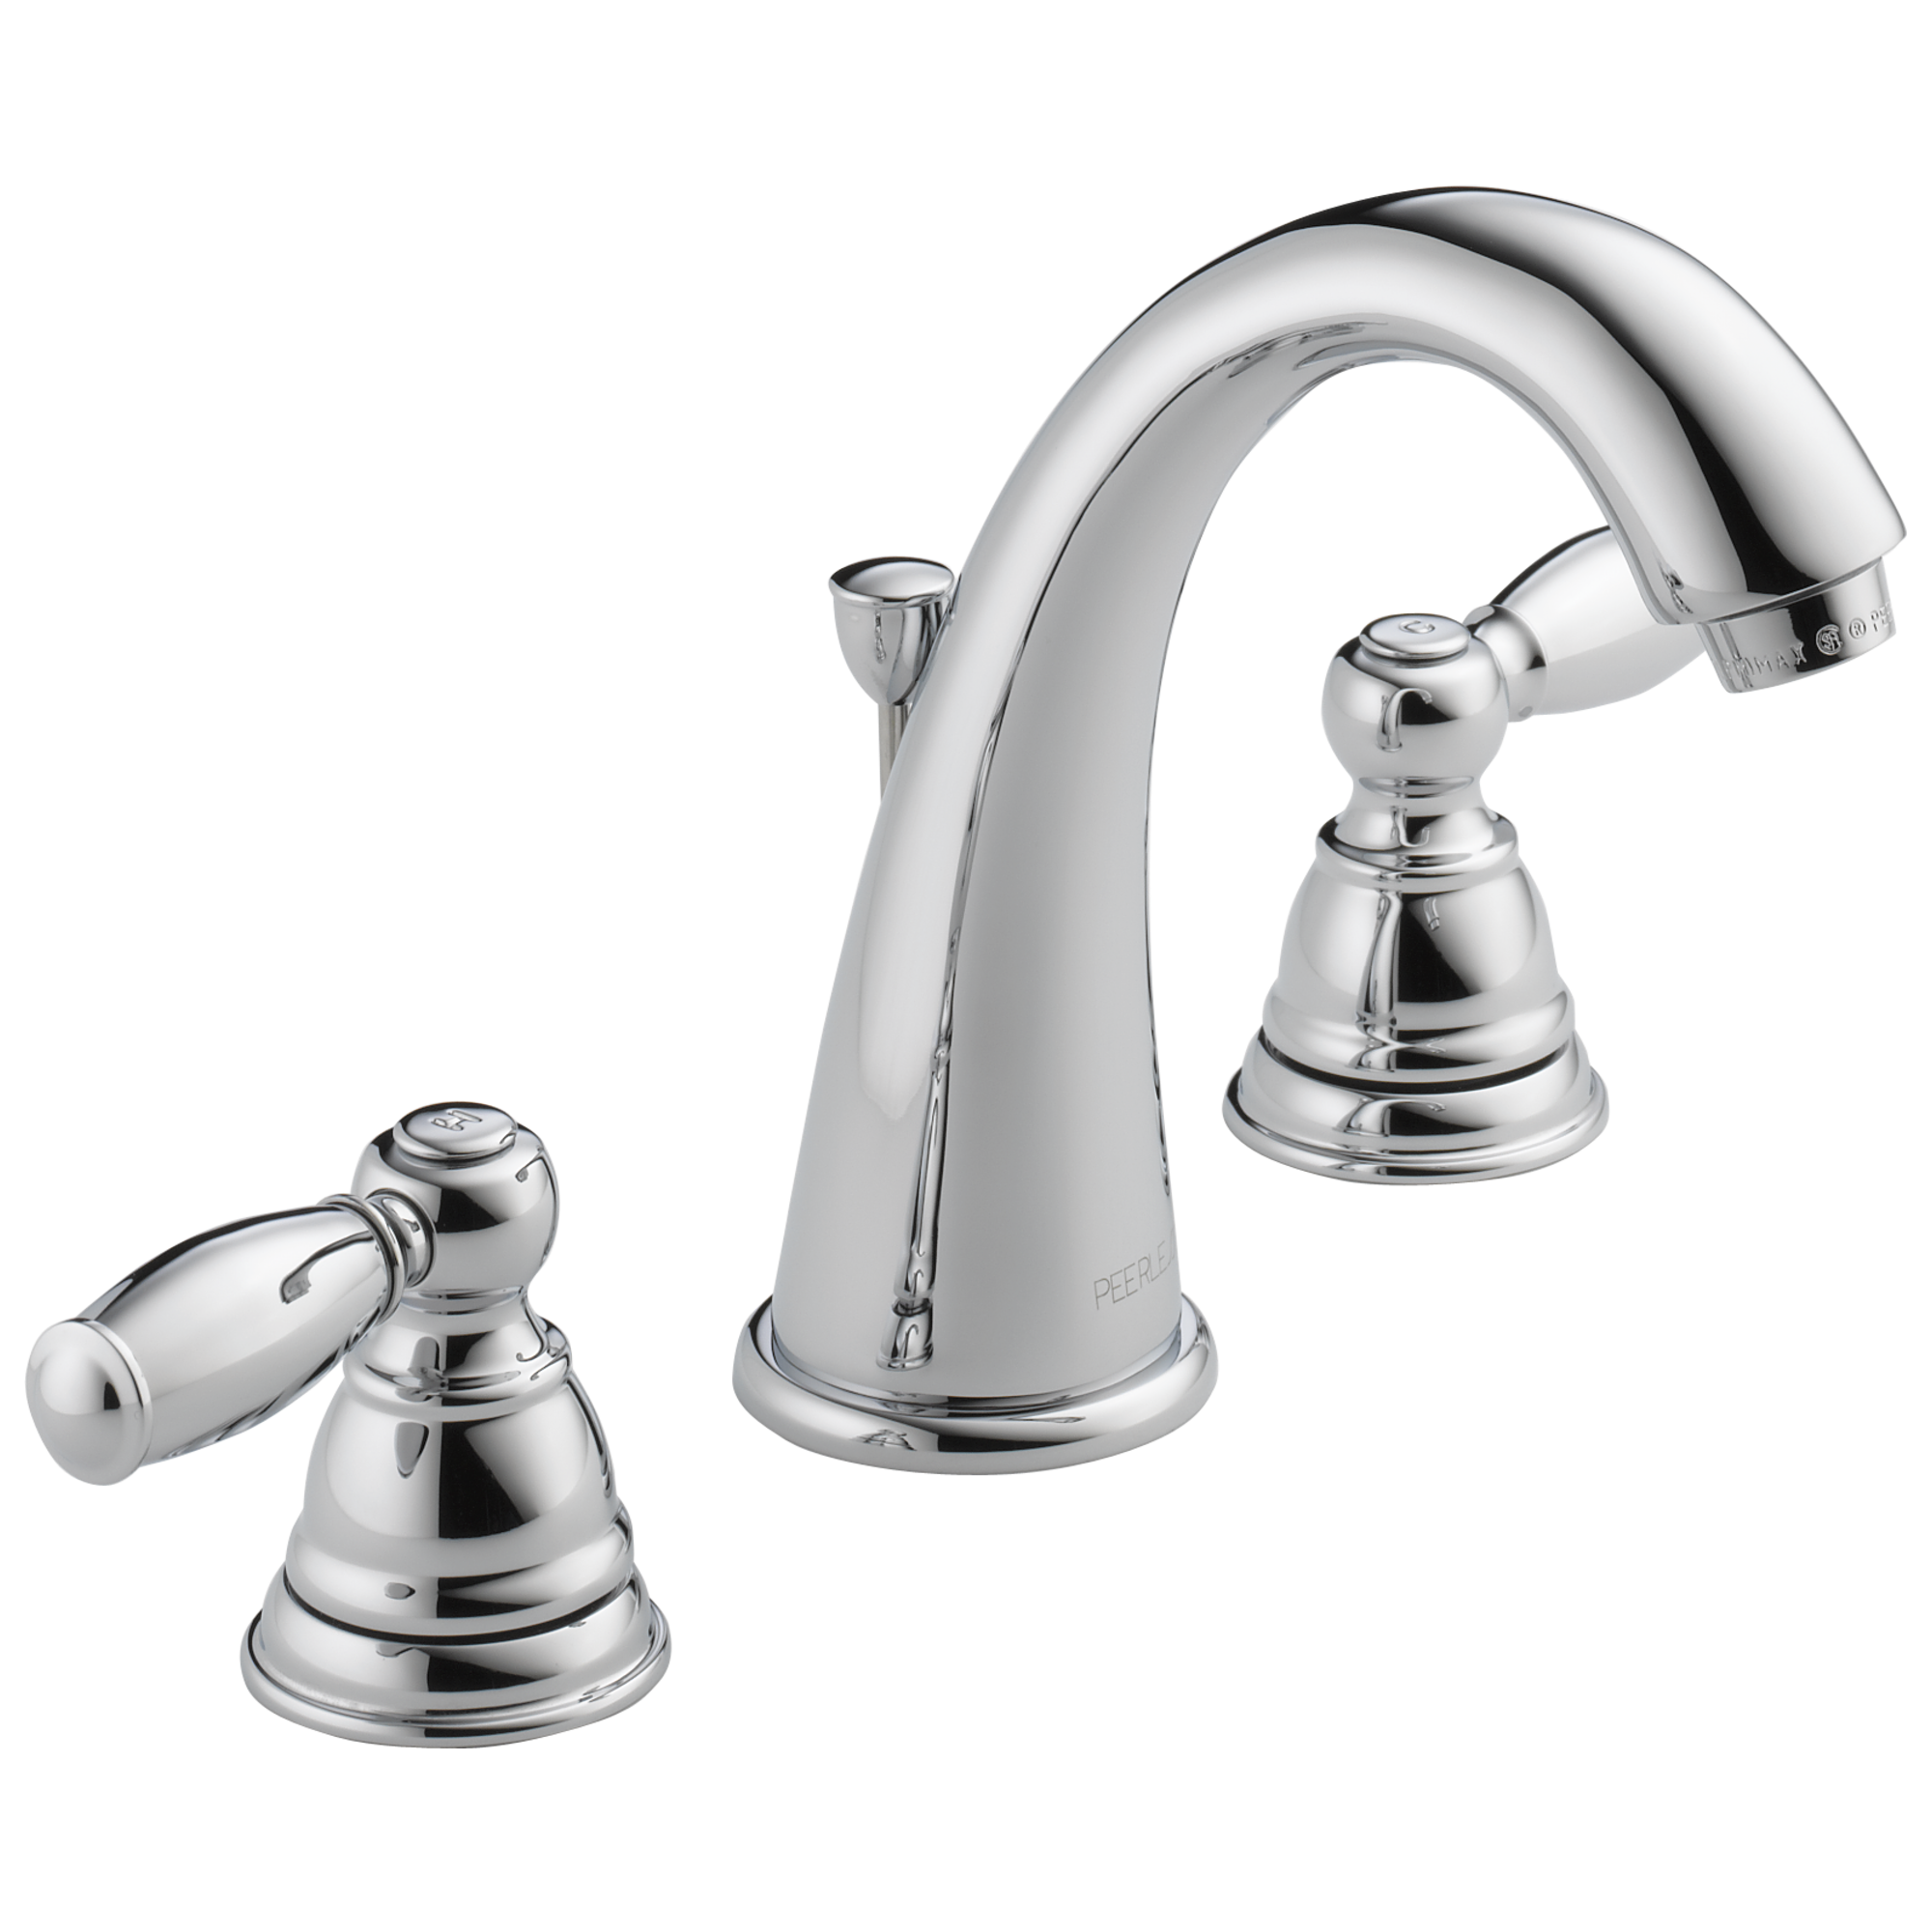 Peerless Claymore Two Handle Bathroom Faucet In Chrome P299196lf Walmart Com Walmart Com